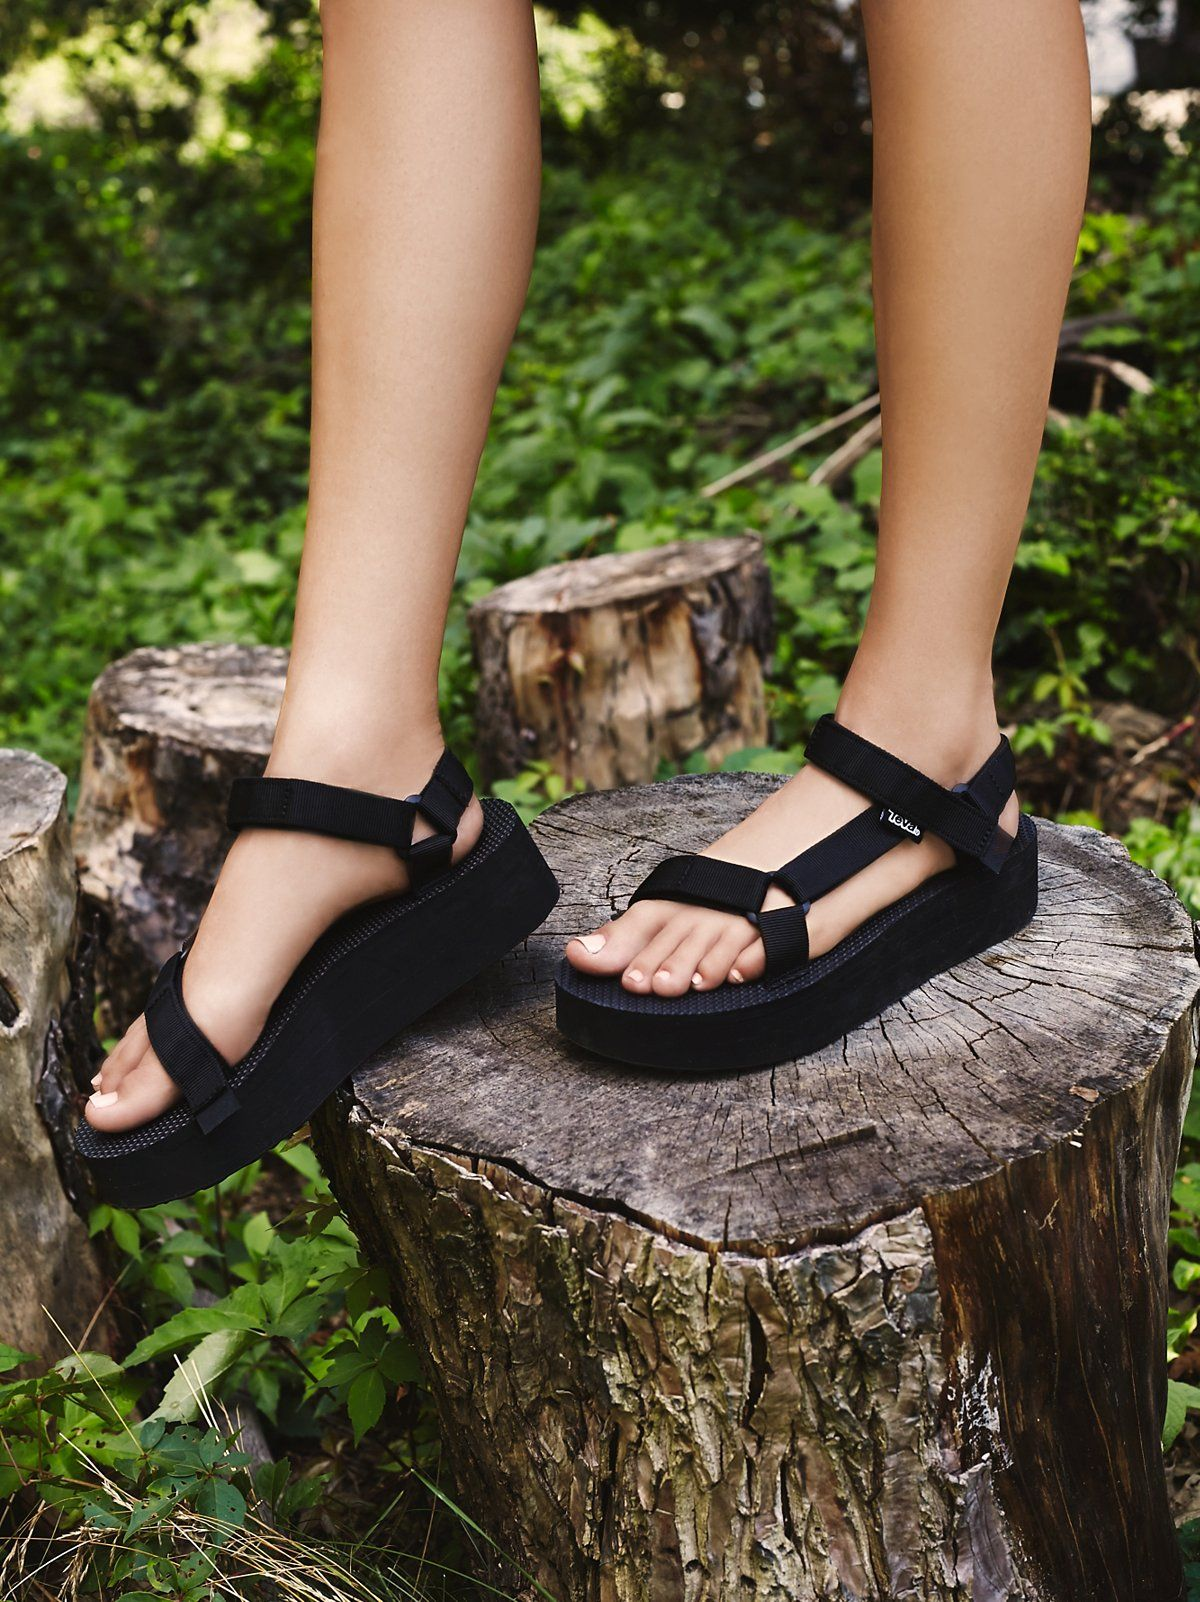 e6a1fdb4a85e Universal Flatform Teva Sandal